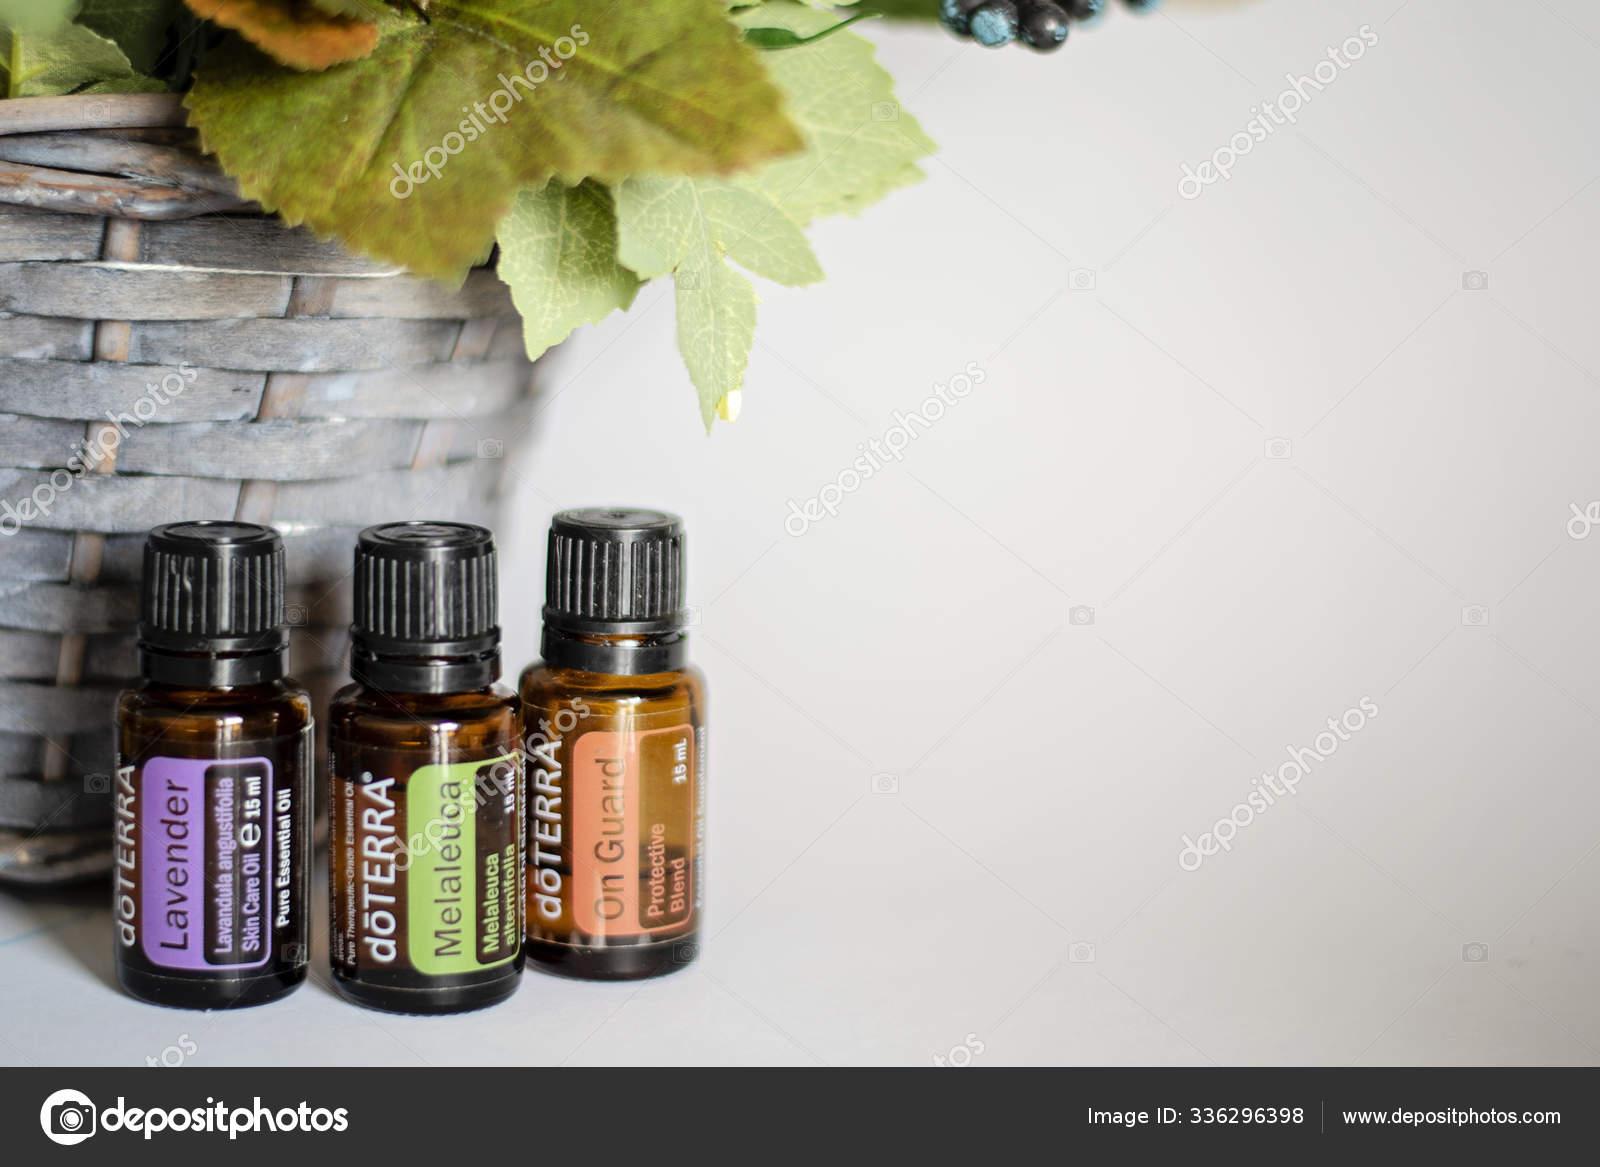 High Quality Essential Oils Doterra Brand Stock Editorial Photo C Matusskaaaaa 336296398